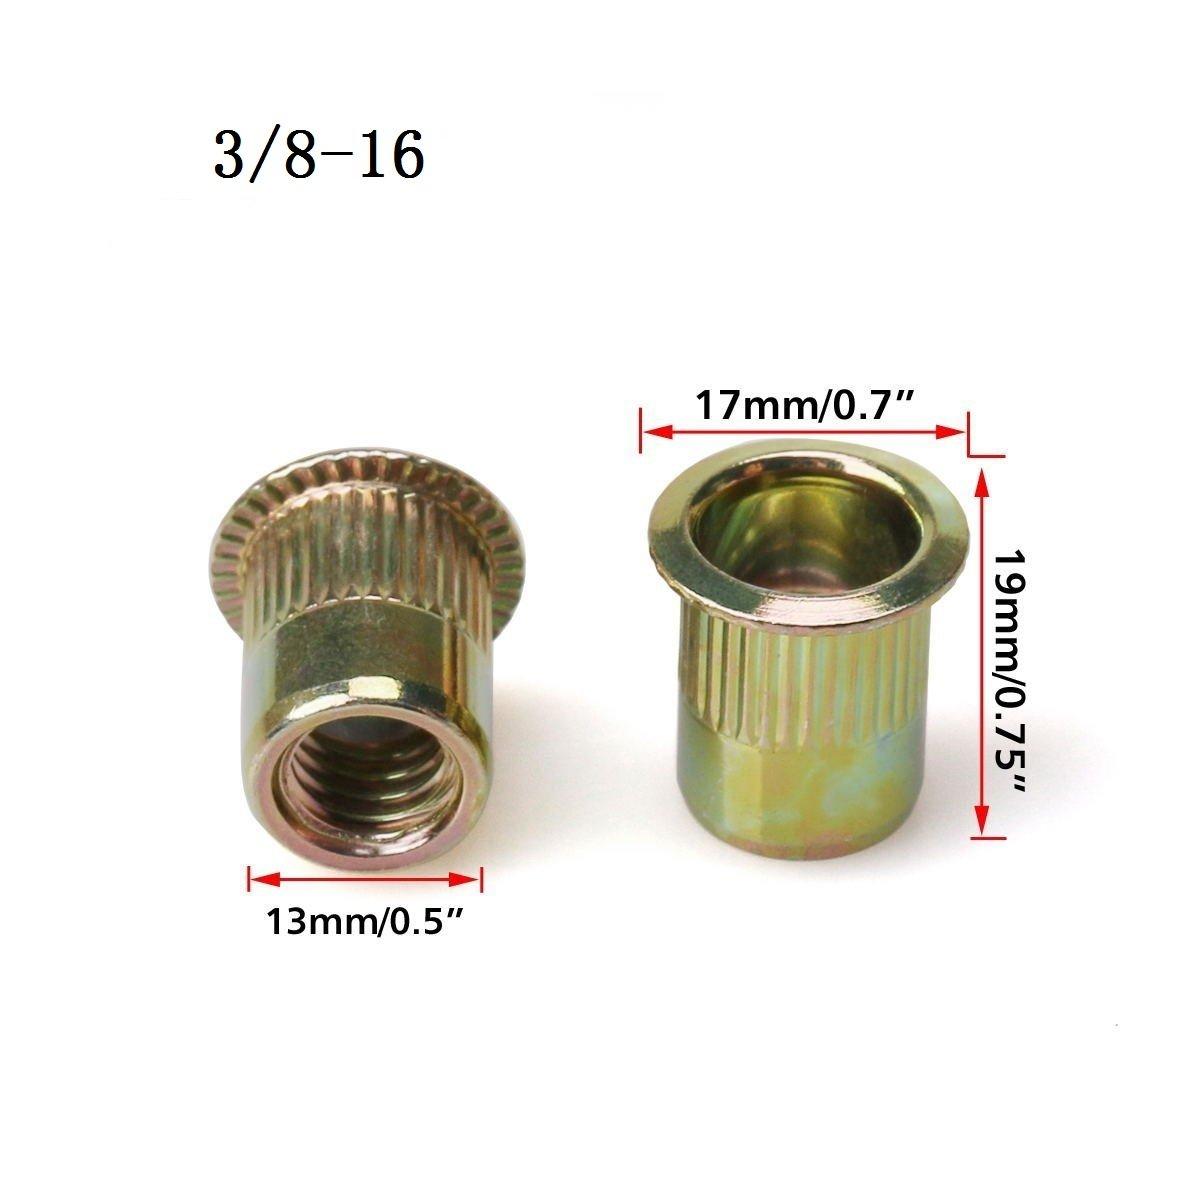 Caterpillar ForkLift Ball Arm 387560 Pitman Cat 1040 448312 Mitsubishi MB0387560